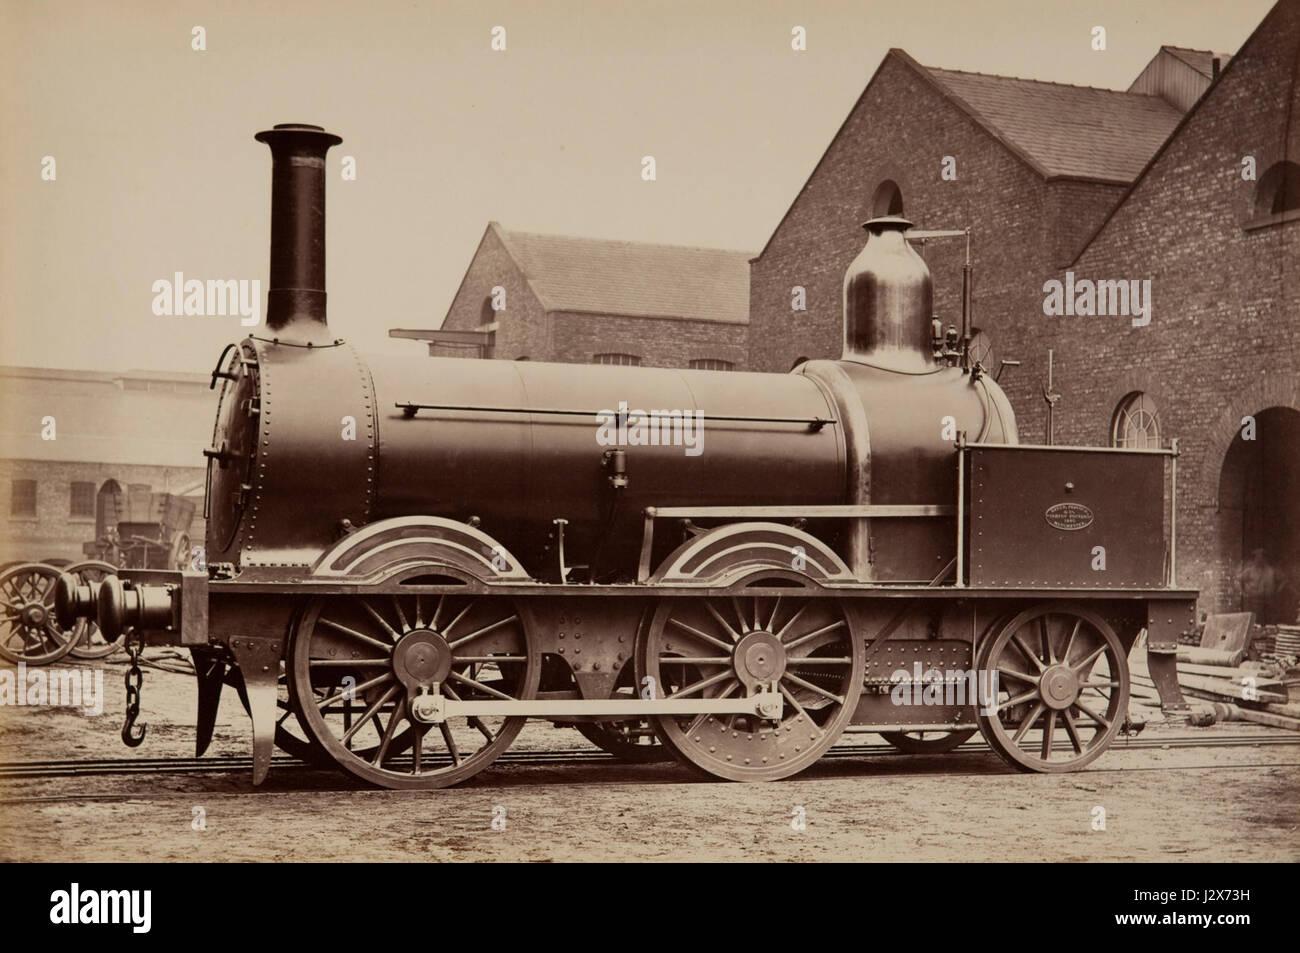 Beyer Peacock - Madras Railway No 425 - Stock Image